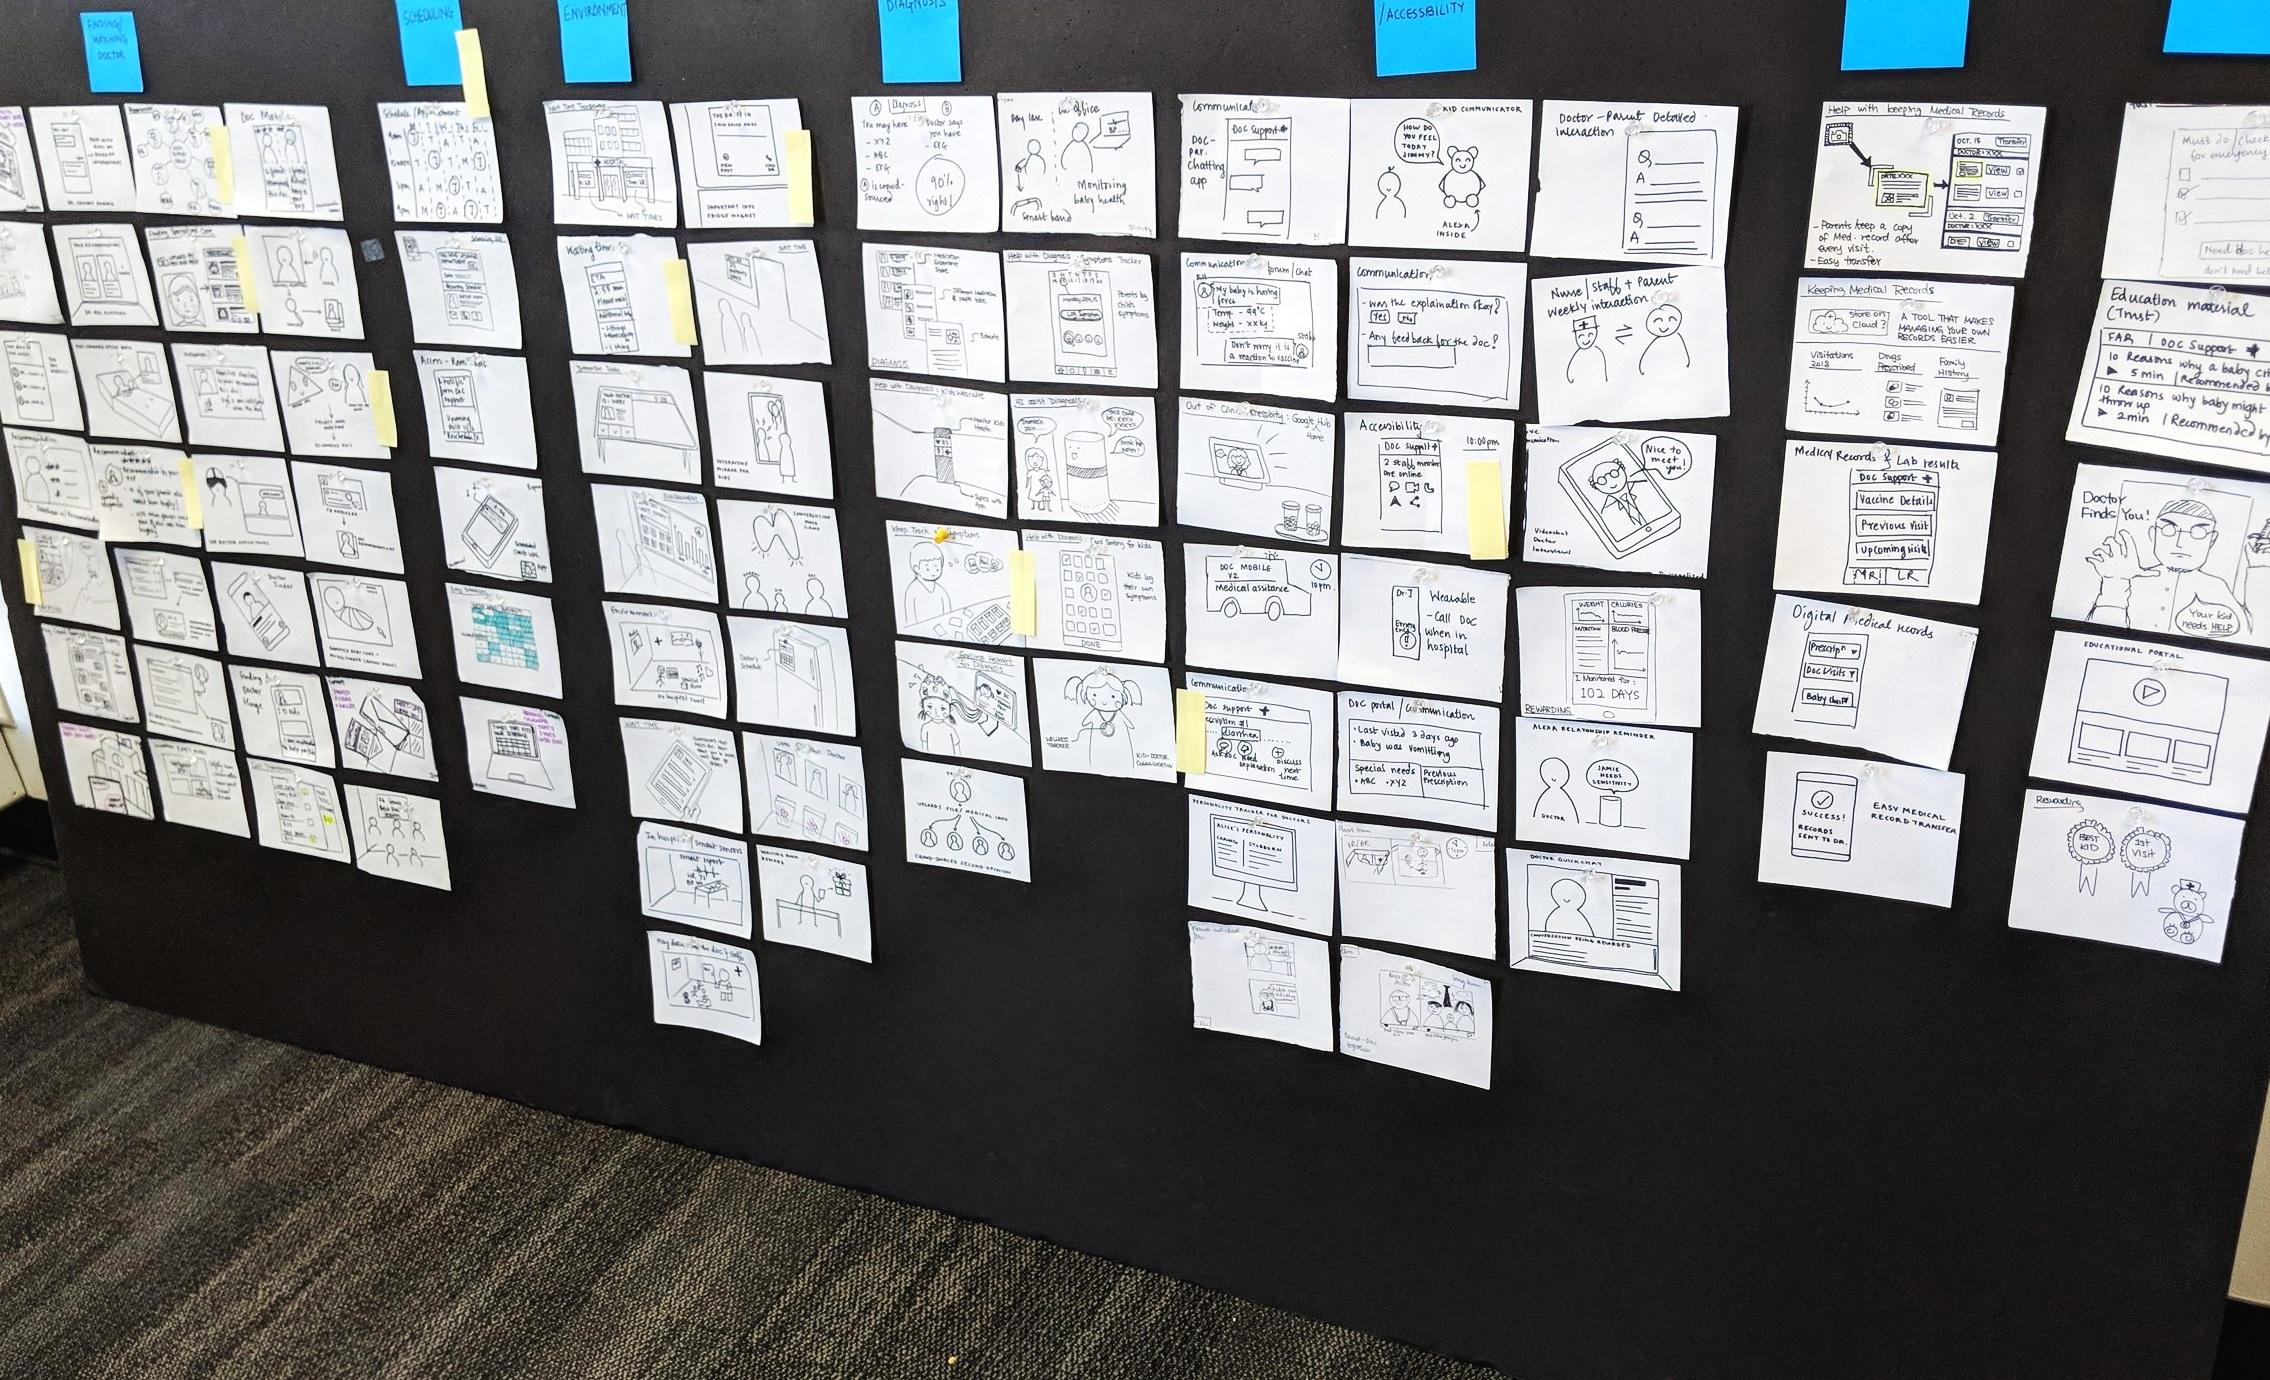 Board full of brainstormed ideas